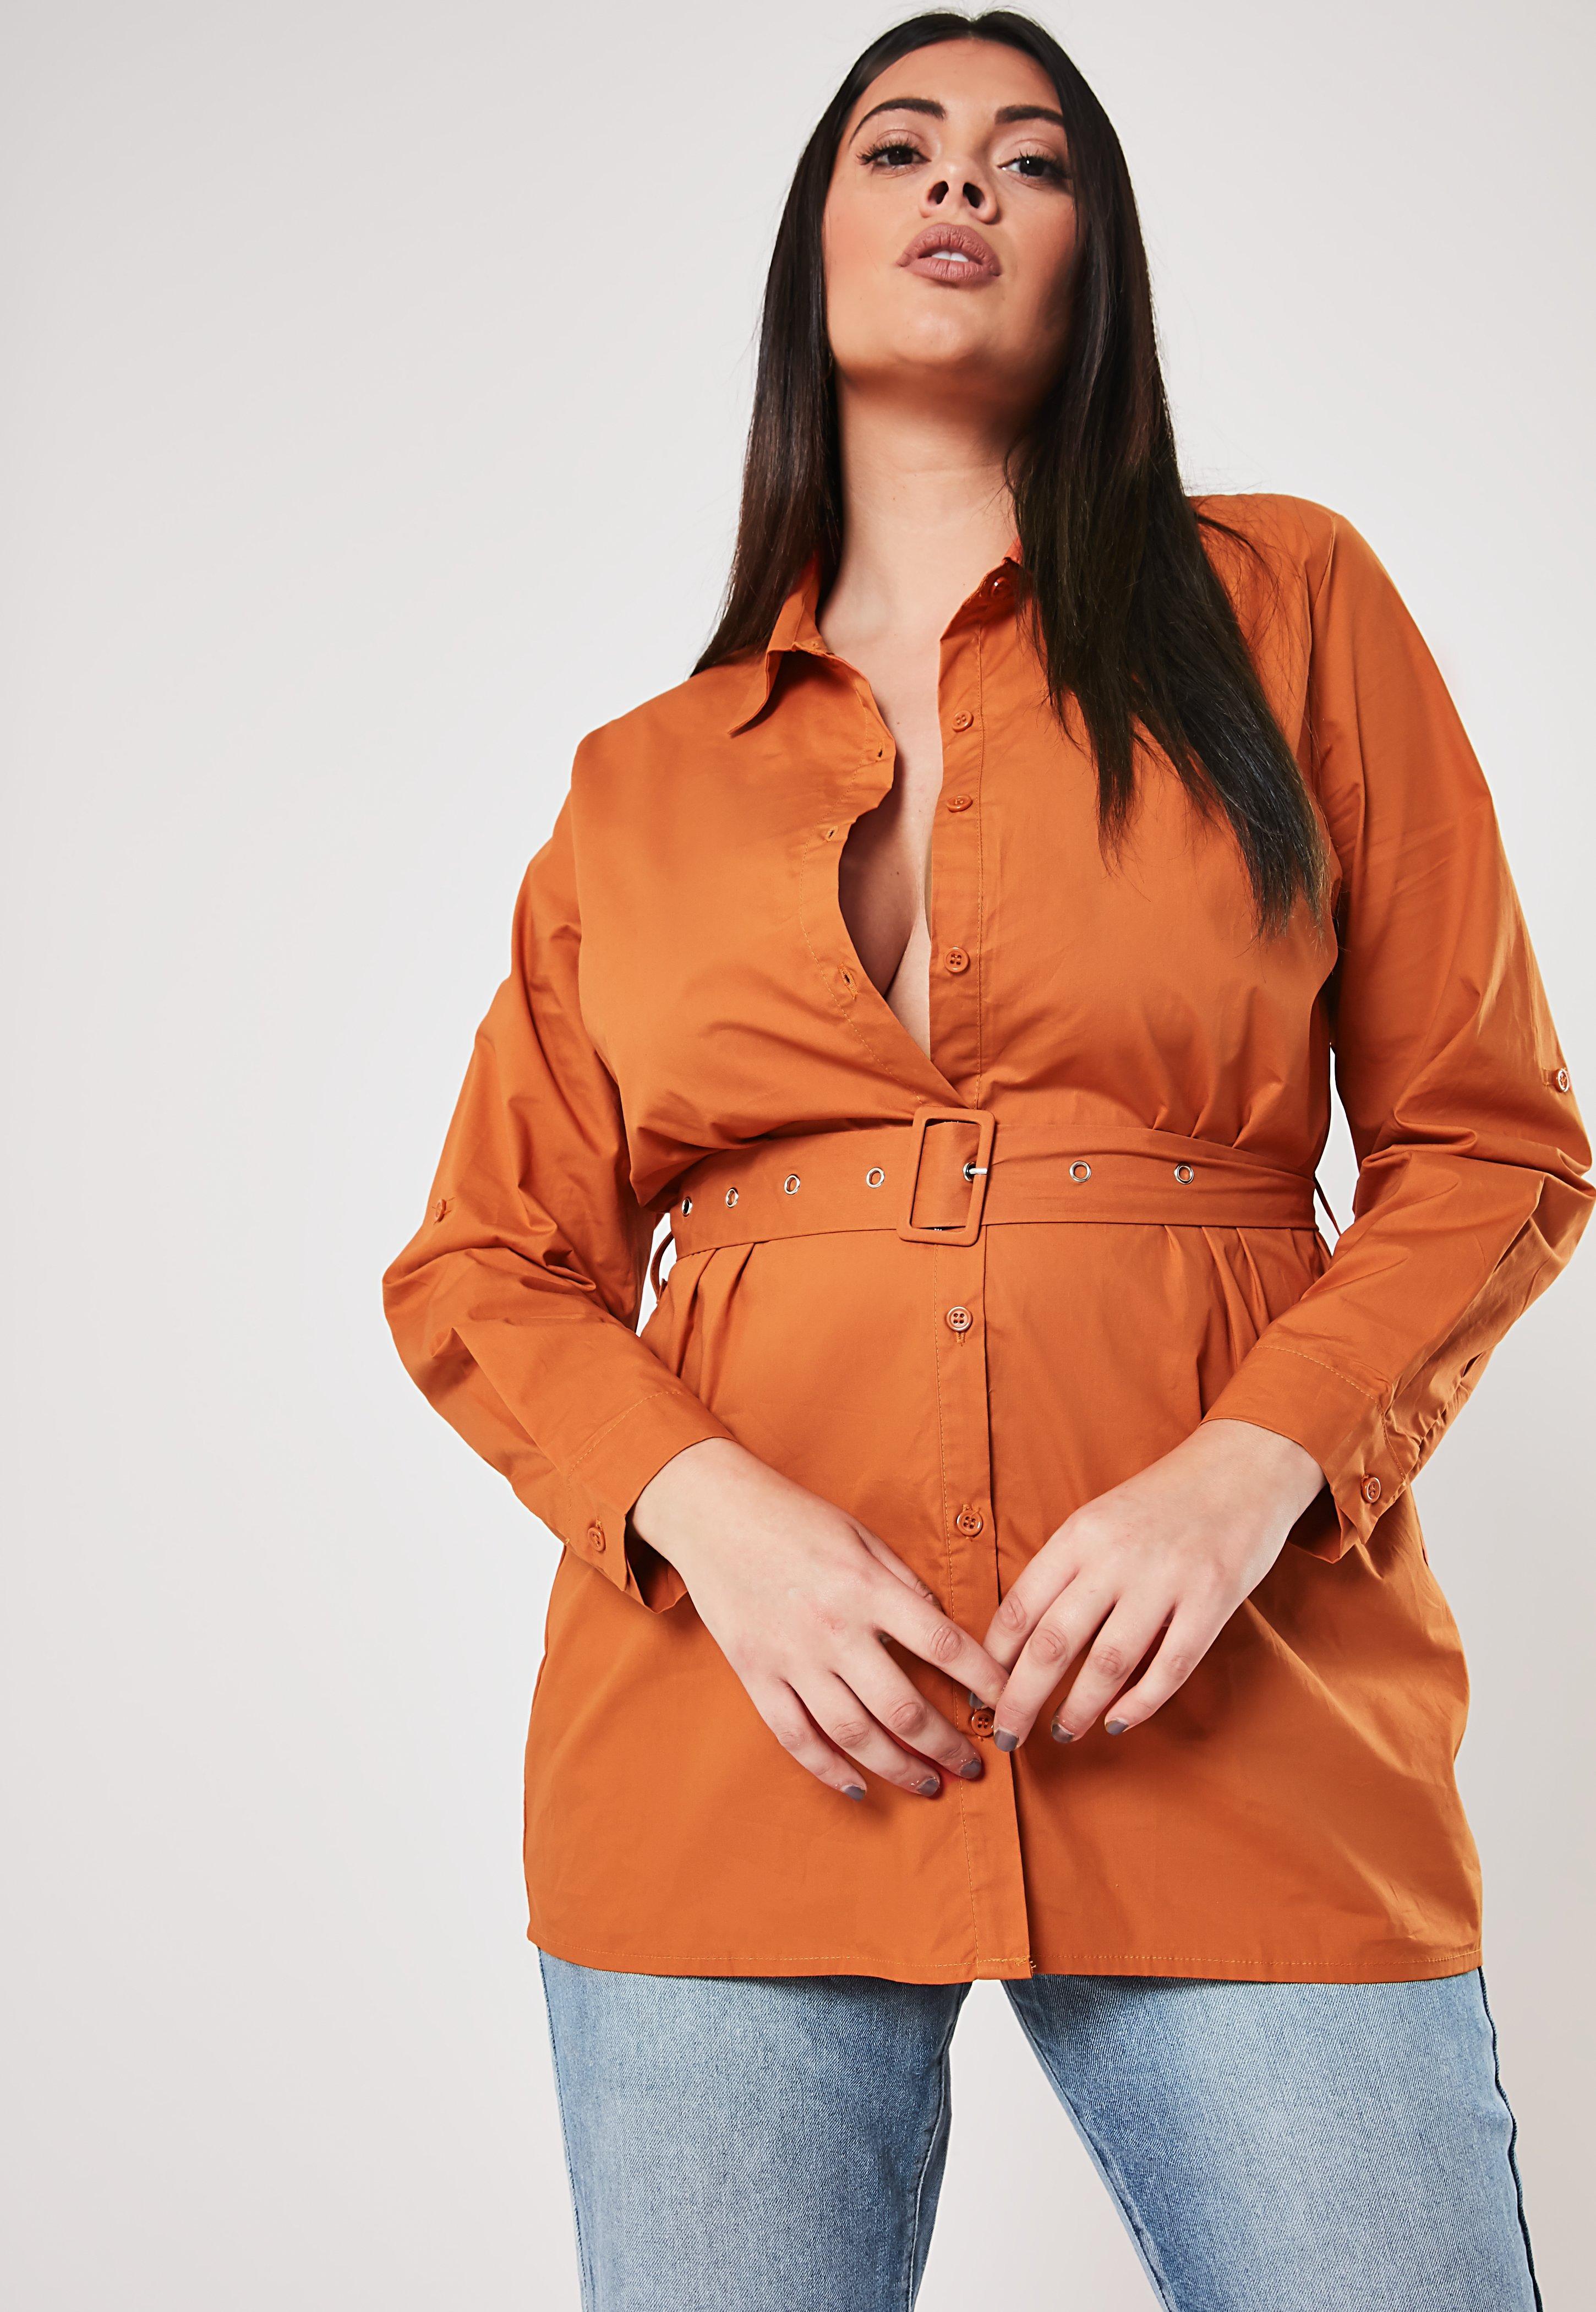 ba43d9890df2ca Women's Shirts | Satin & Oversized Shirts - Missguided